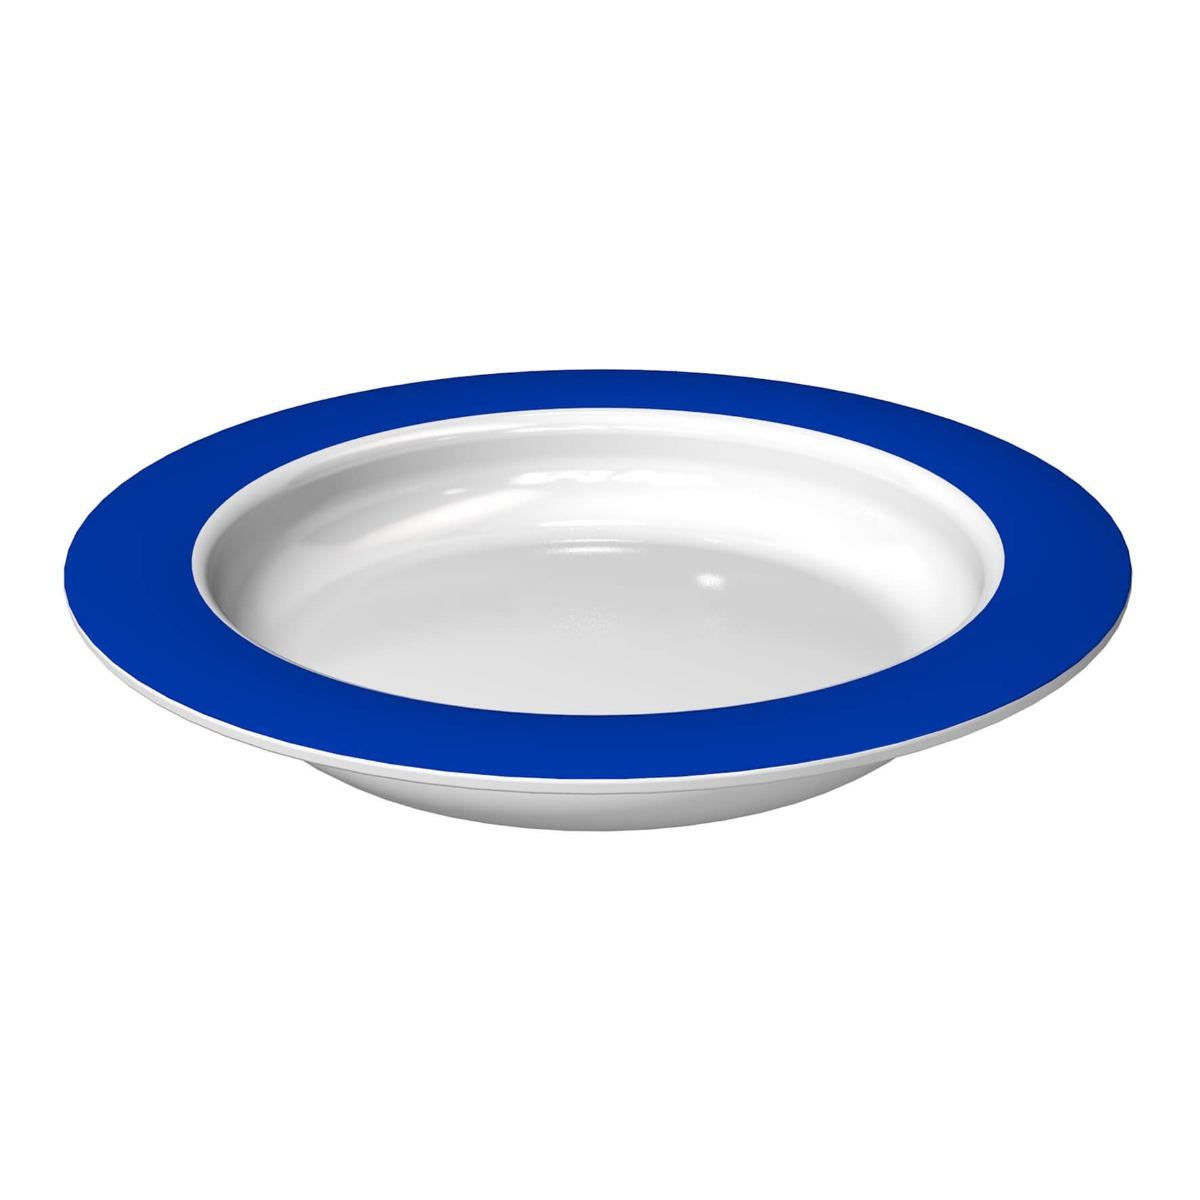 ORNAMIN Teller 902 - blauer Rand